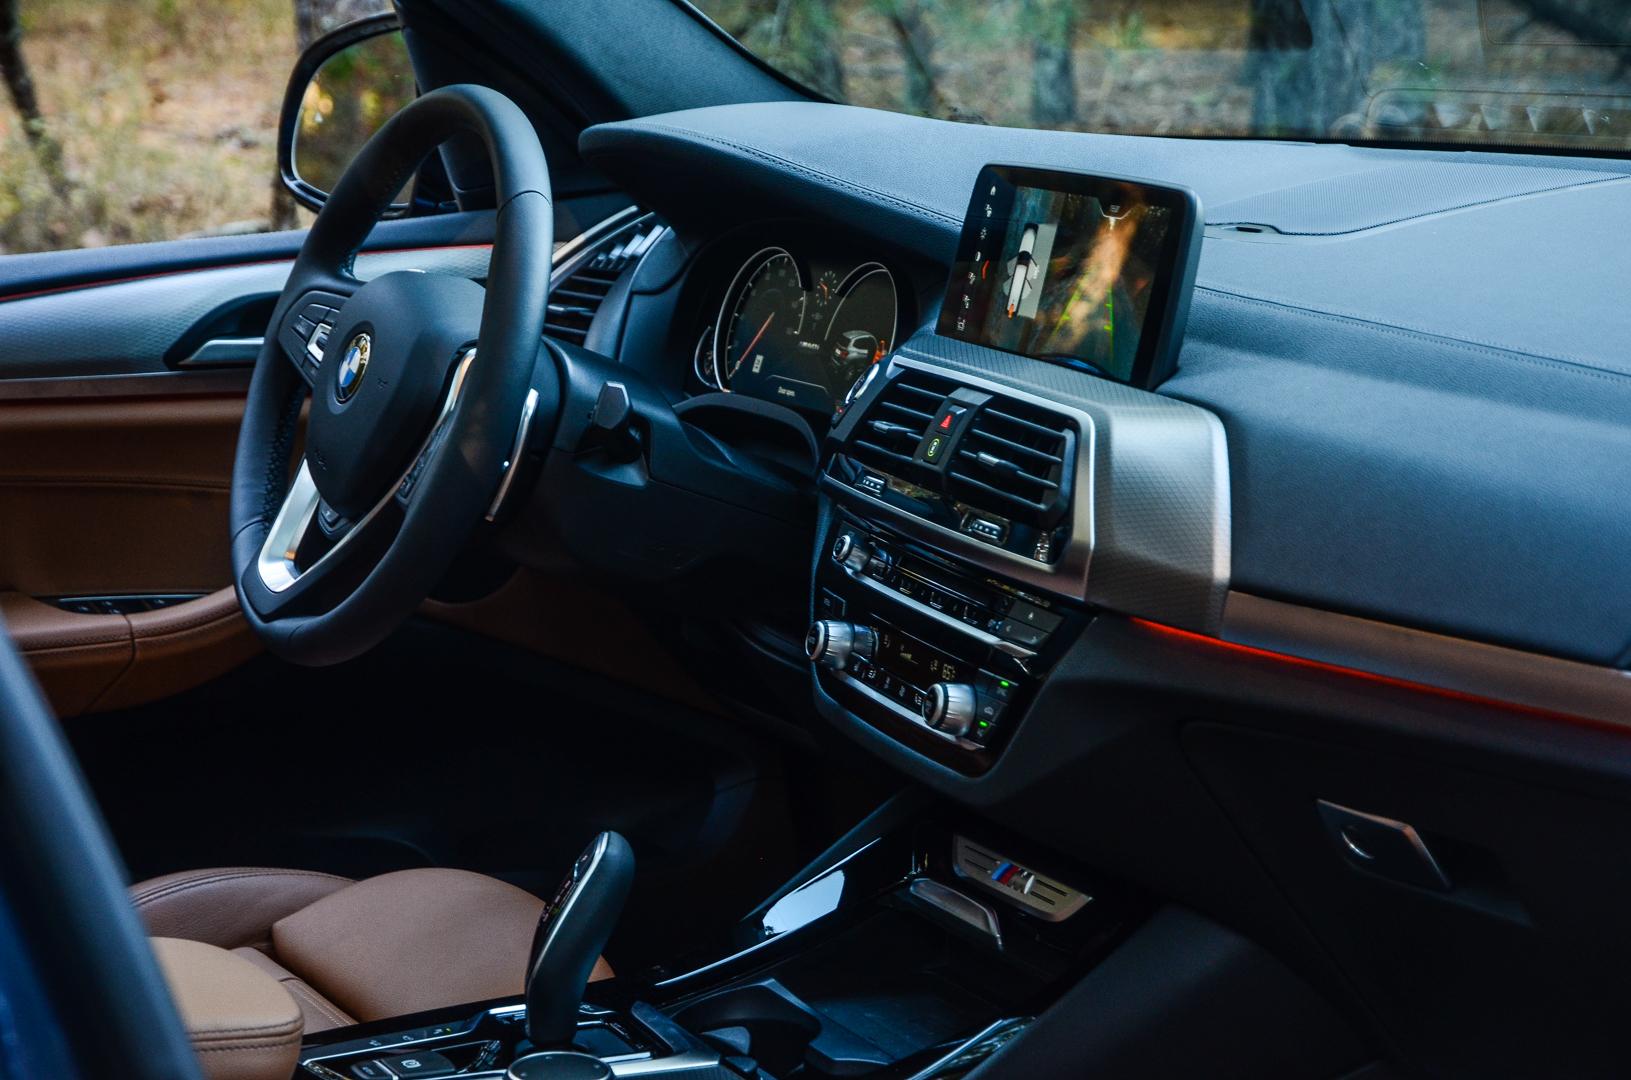 BMW Convertible funny bmw complaint TEST DRIVE: BMW X3 M40i -- A Bavarian Labrador Retriever